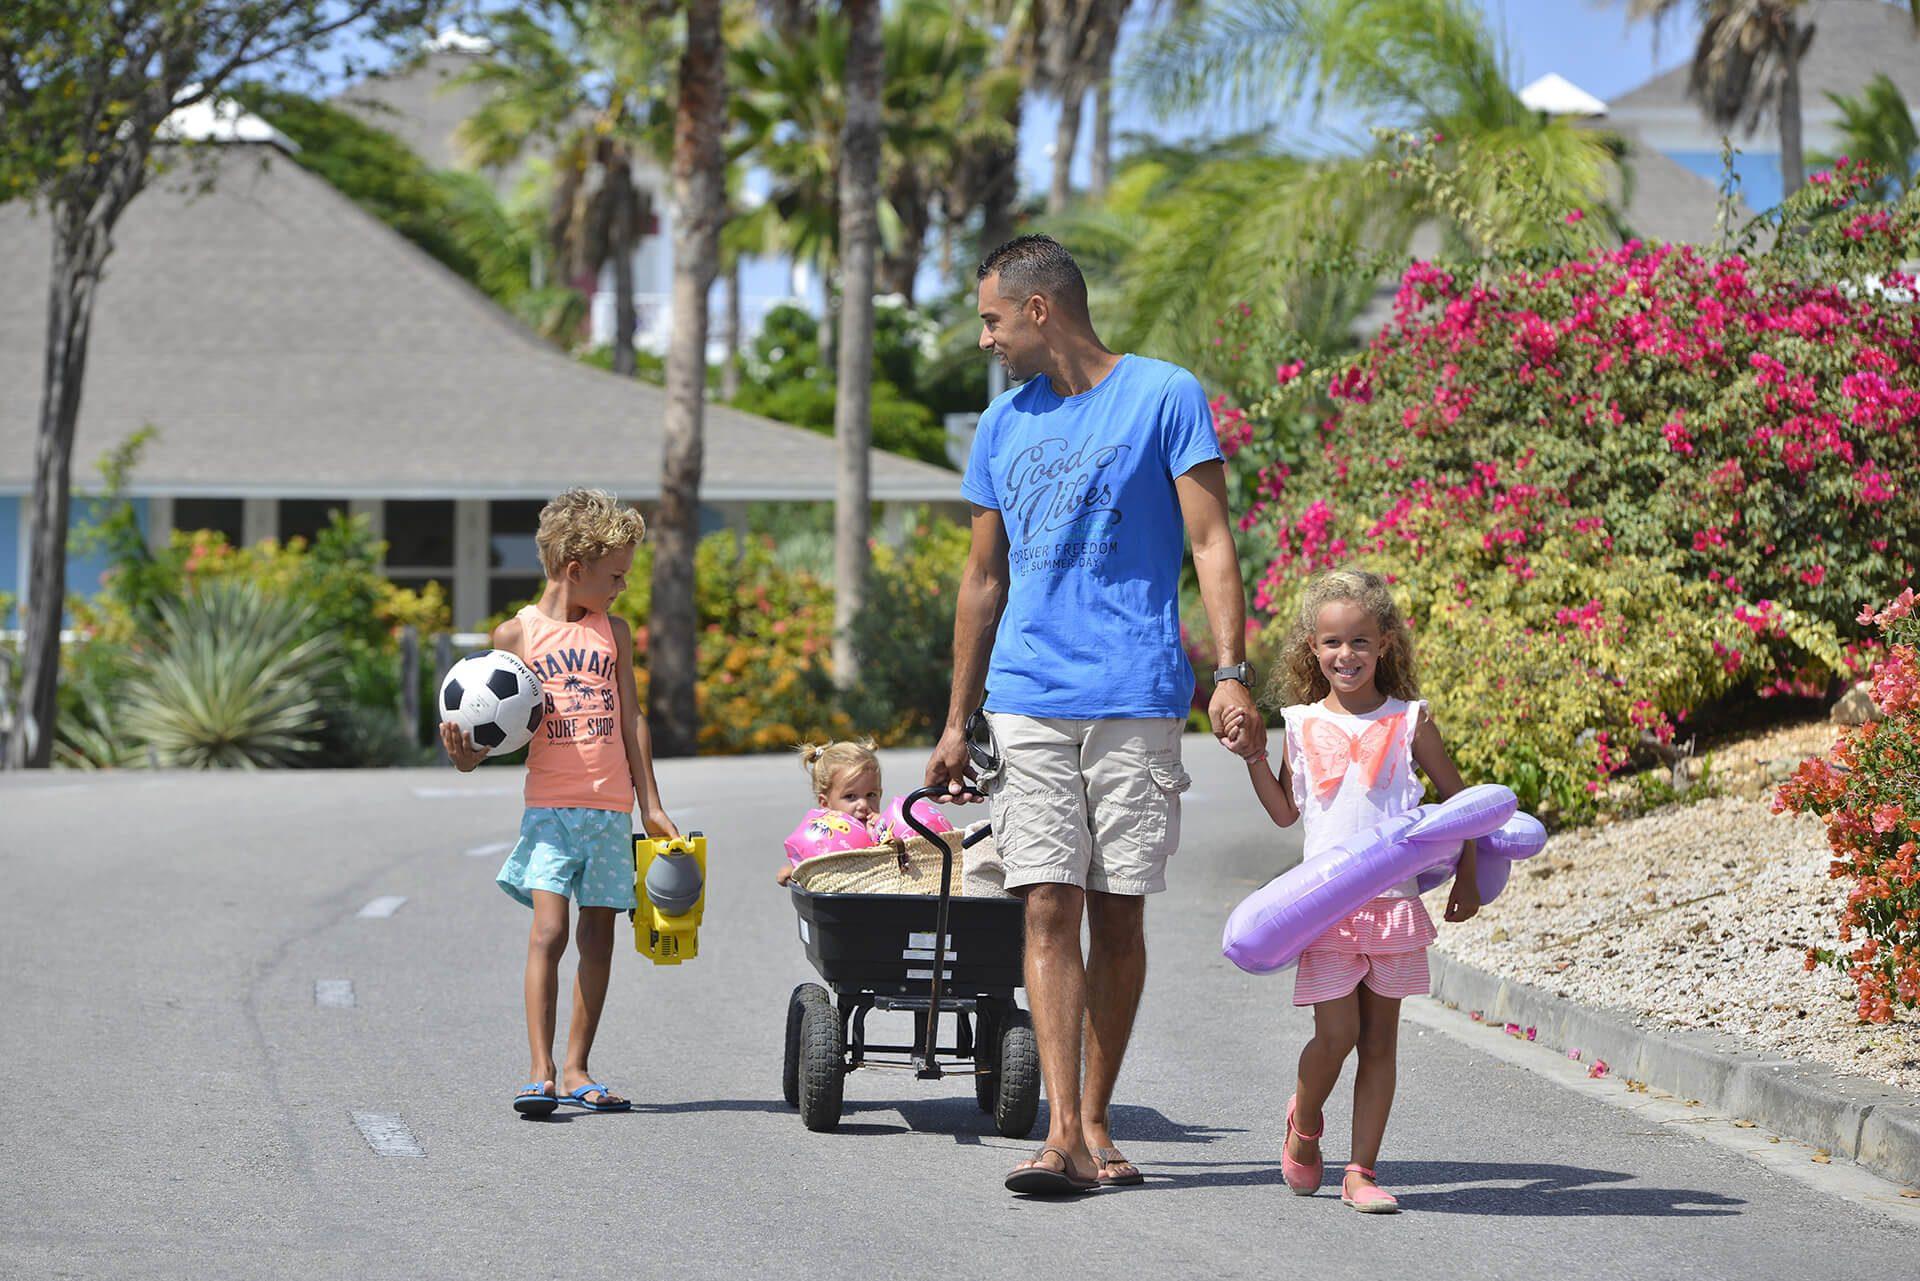 A family enjoying their rental beach cart at Chogogo Curacao.